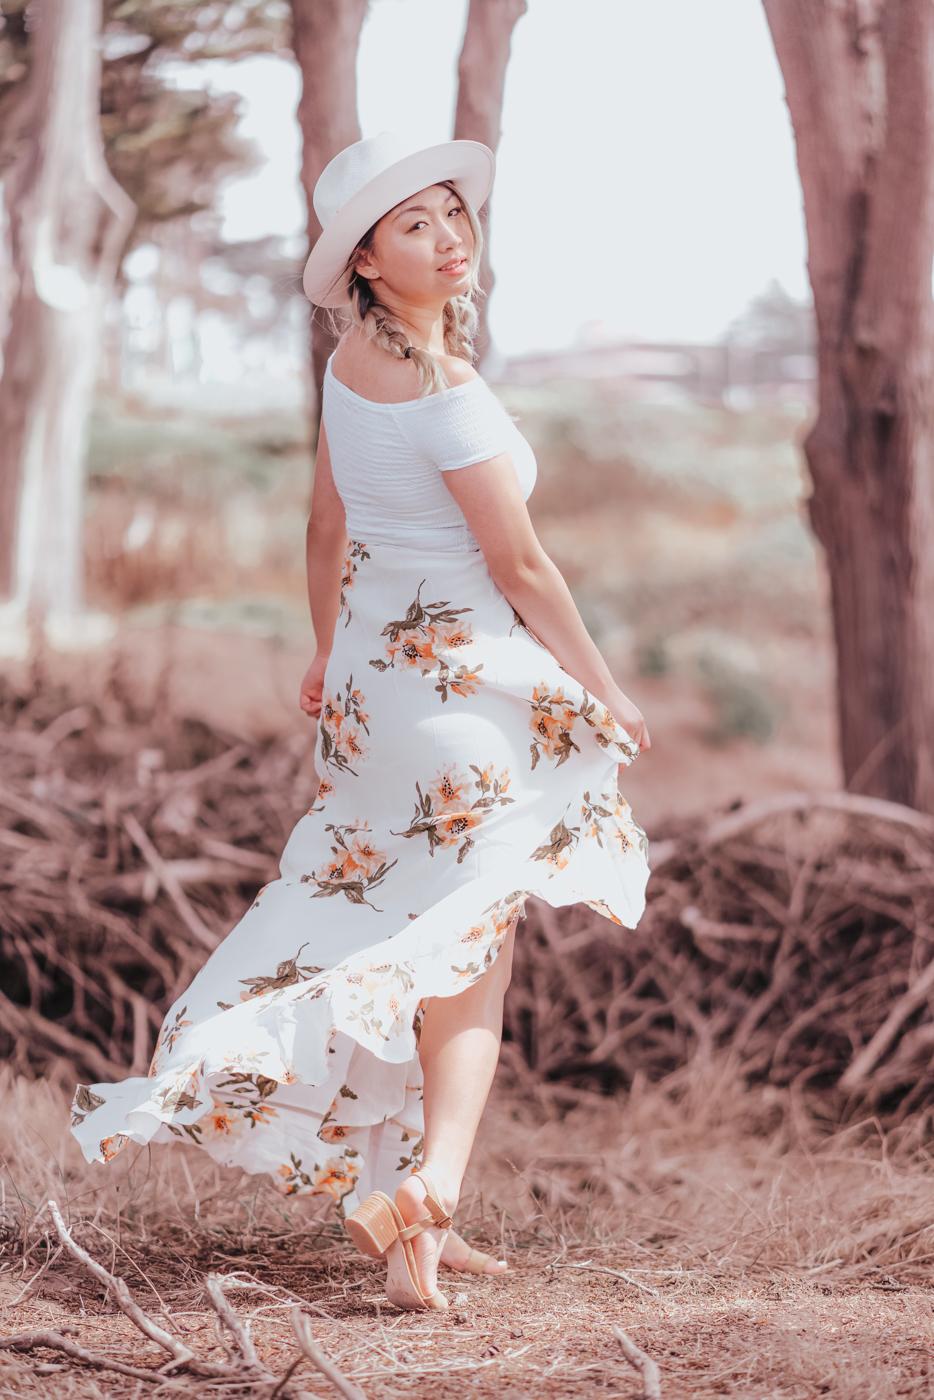 Flynn Skye Orange Blossoms Maxi Skirt   The Chic Diary